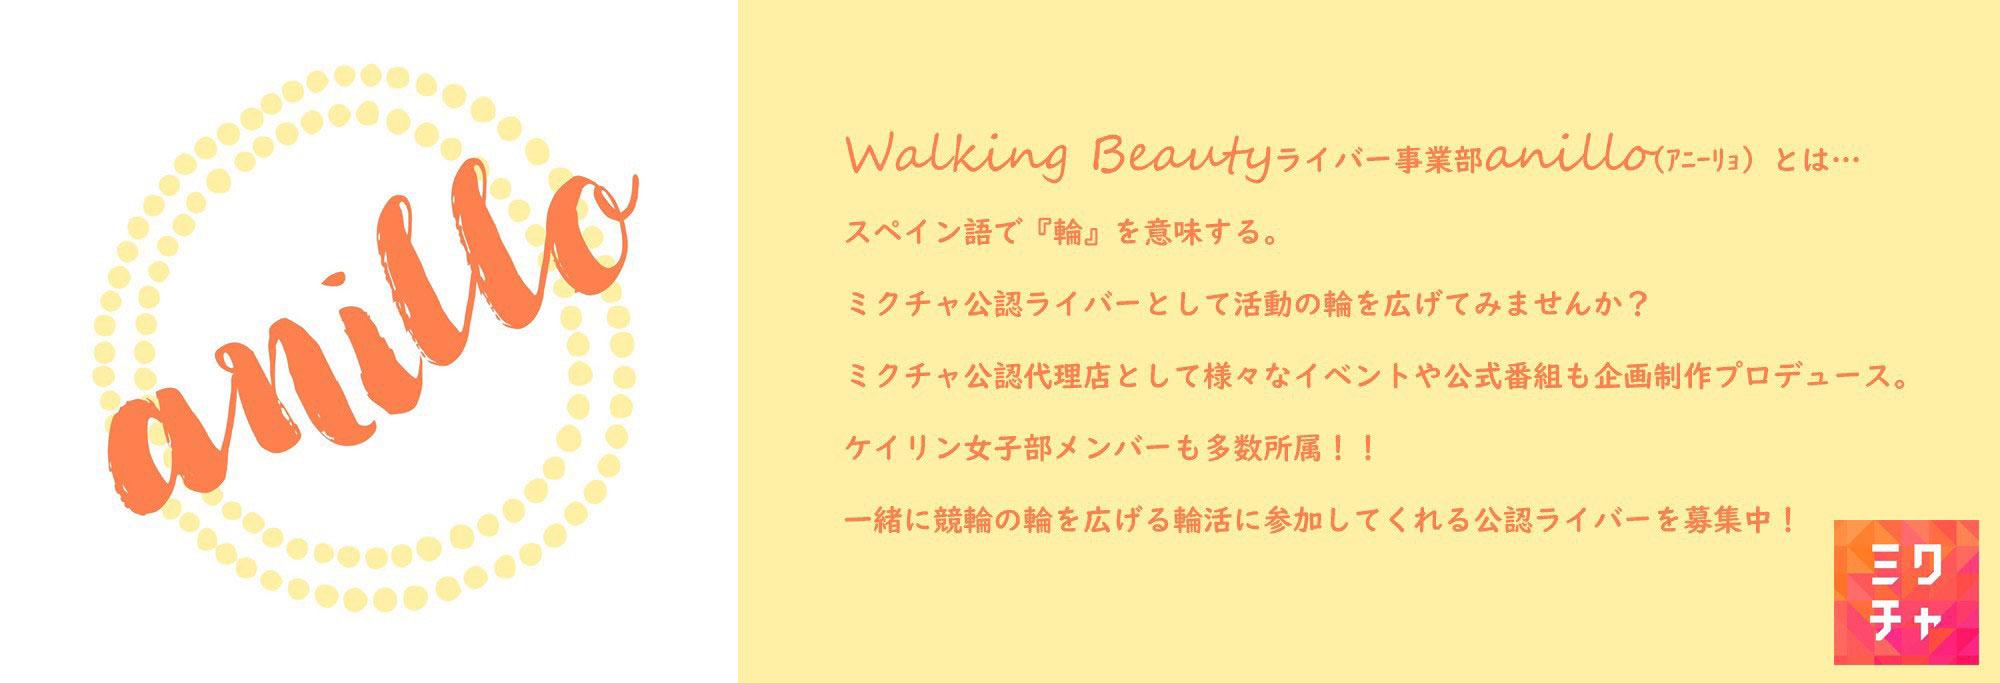 WALKING BEAUTY 人生を美しく歩む